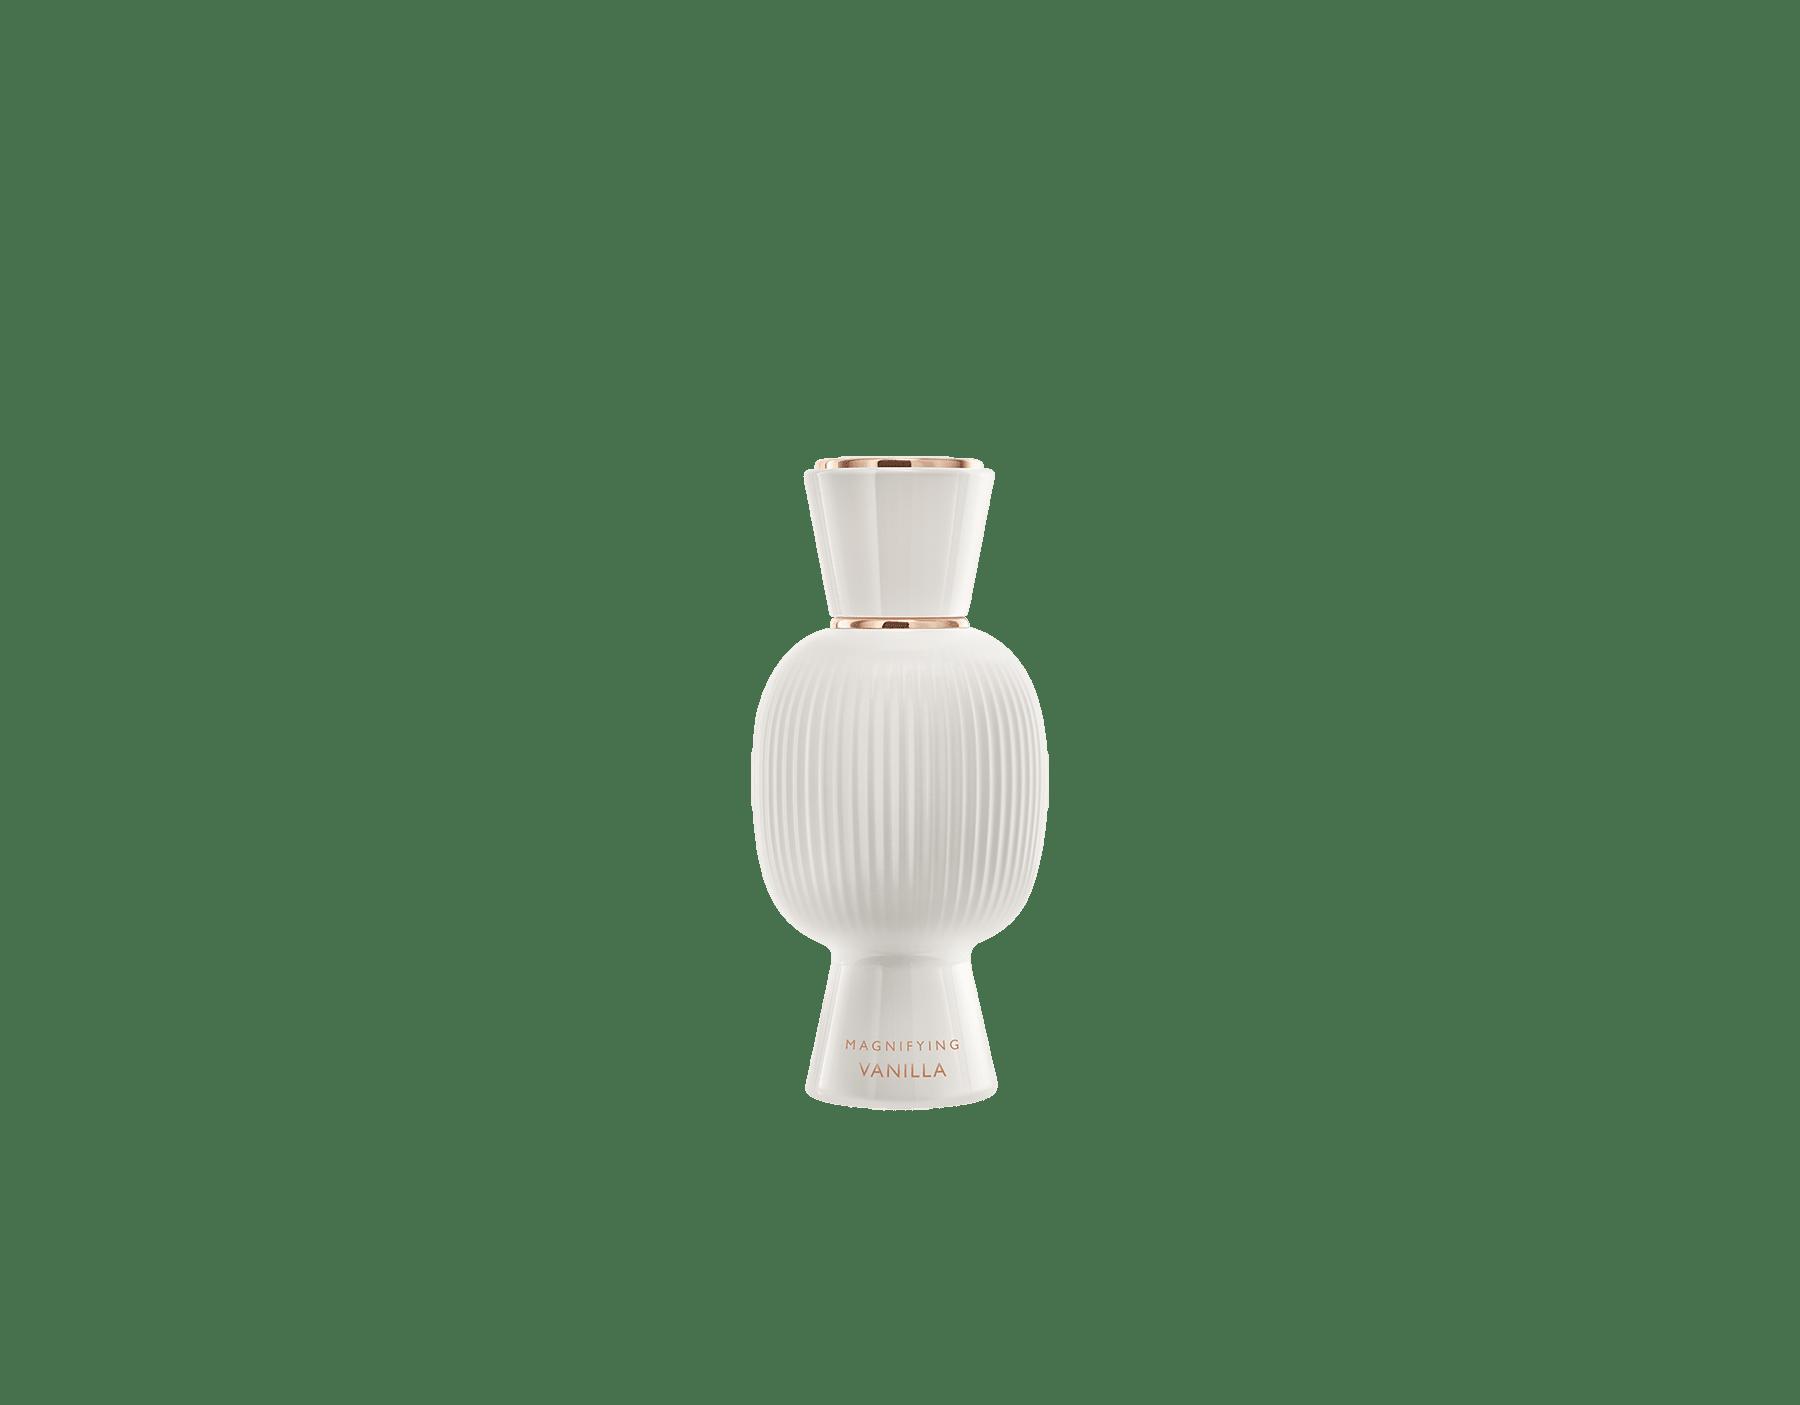 The delightful Magnifying Vanilla brings a seductive addiction to your Eau de Parfum. #MagnifyForMore Thrill 41283 image 6